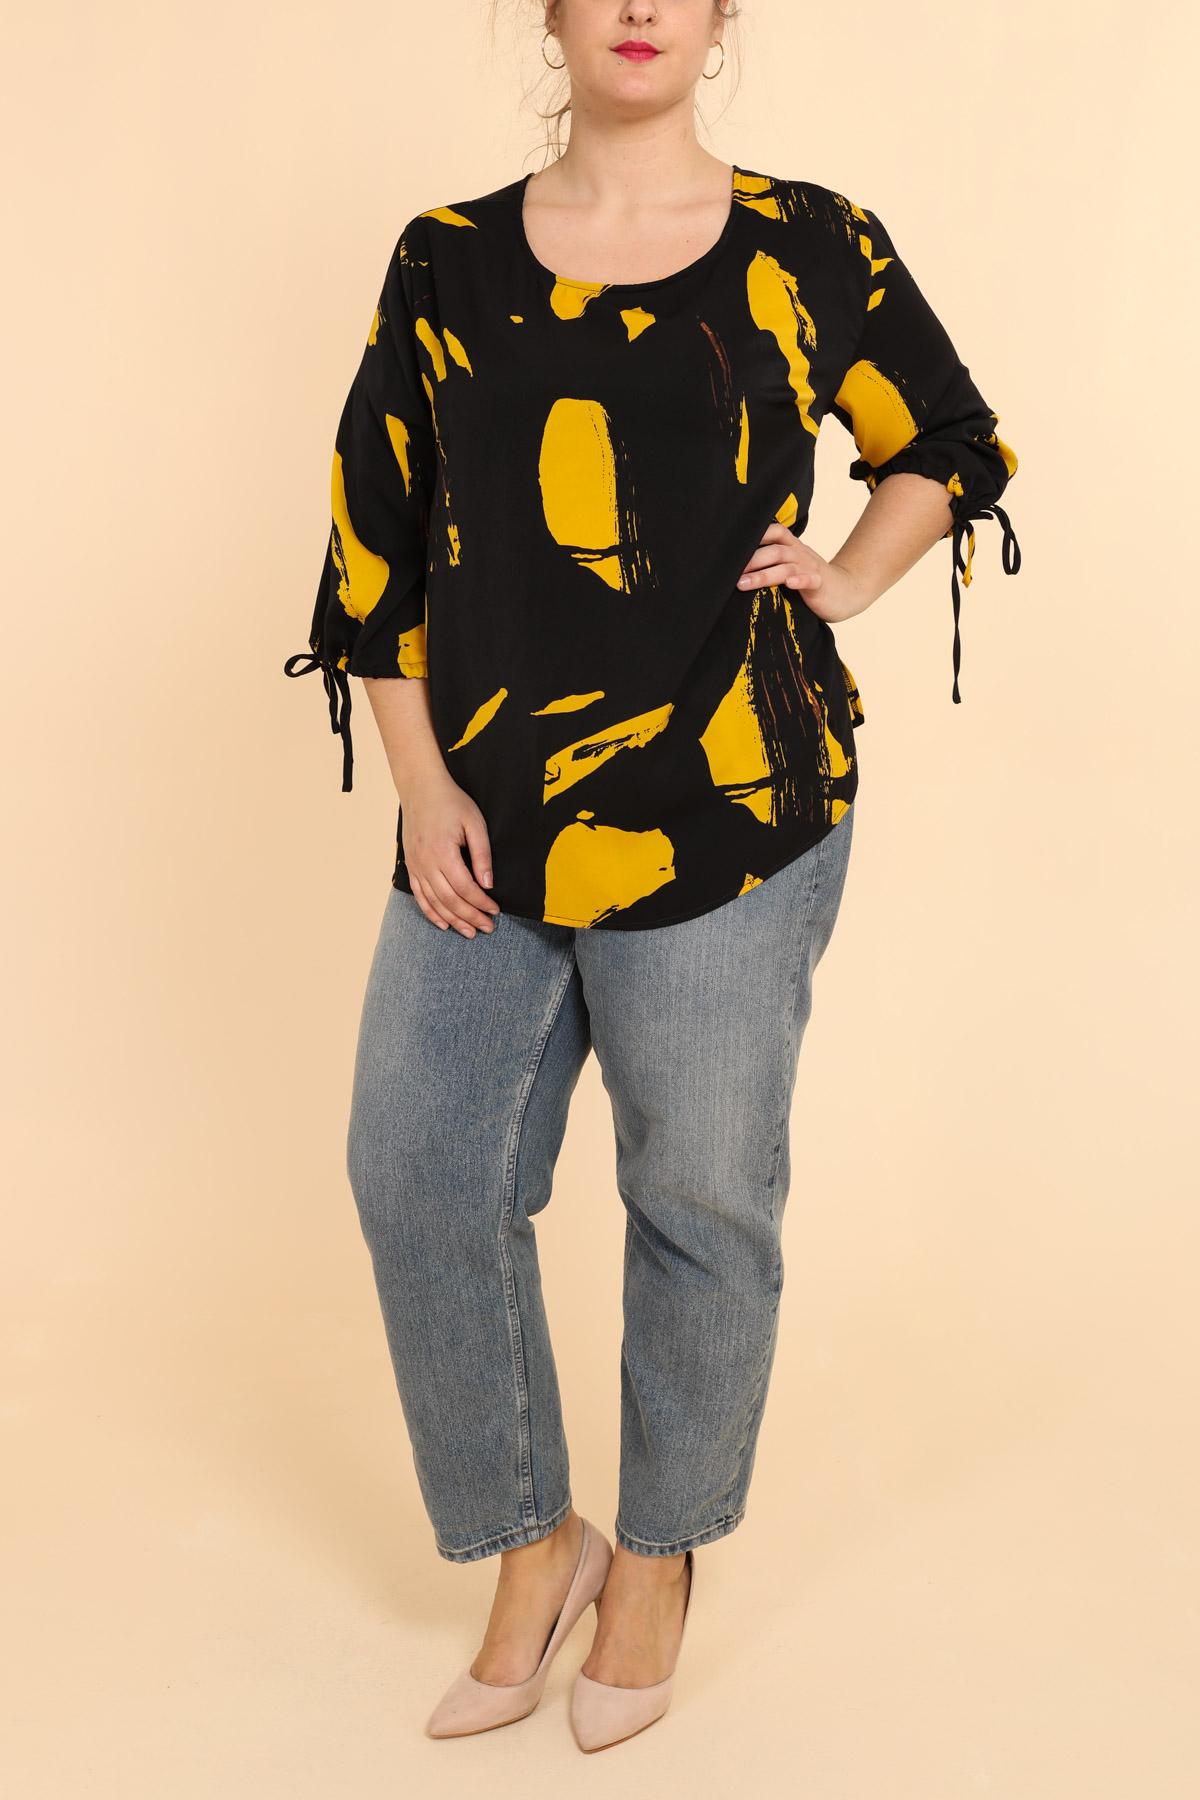 top grande taille femme pomme rouge c6181 jaune 42-56